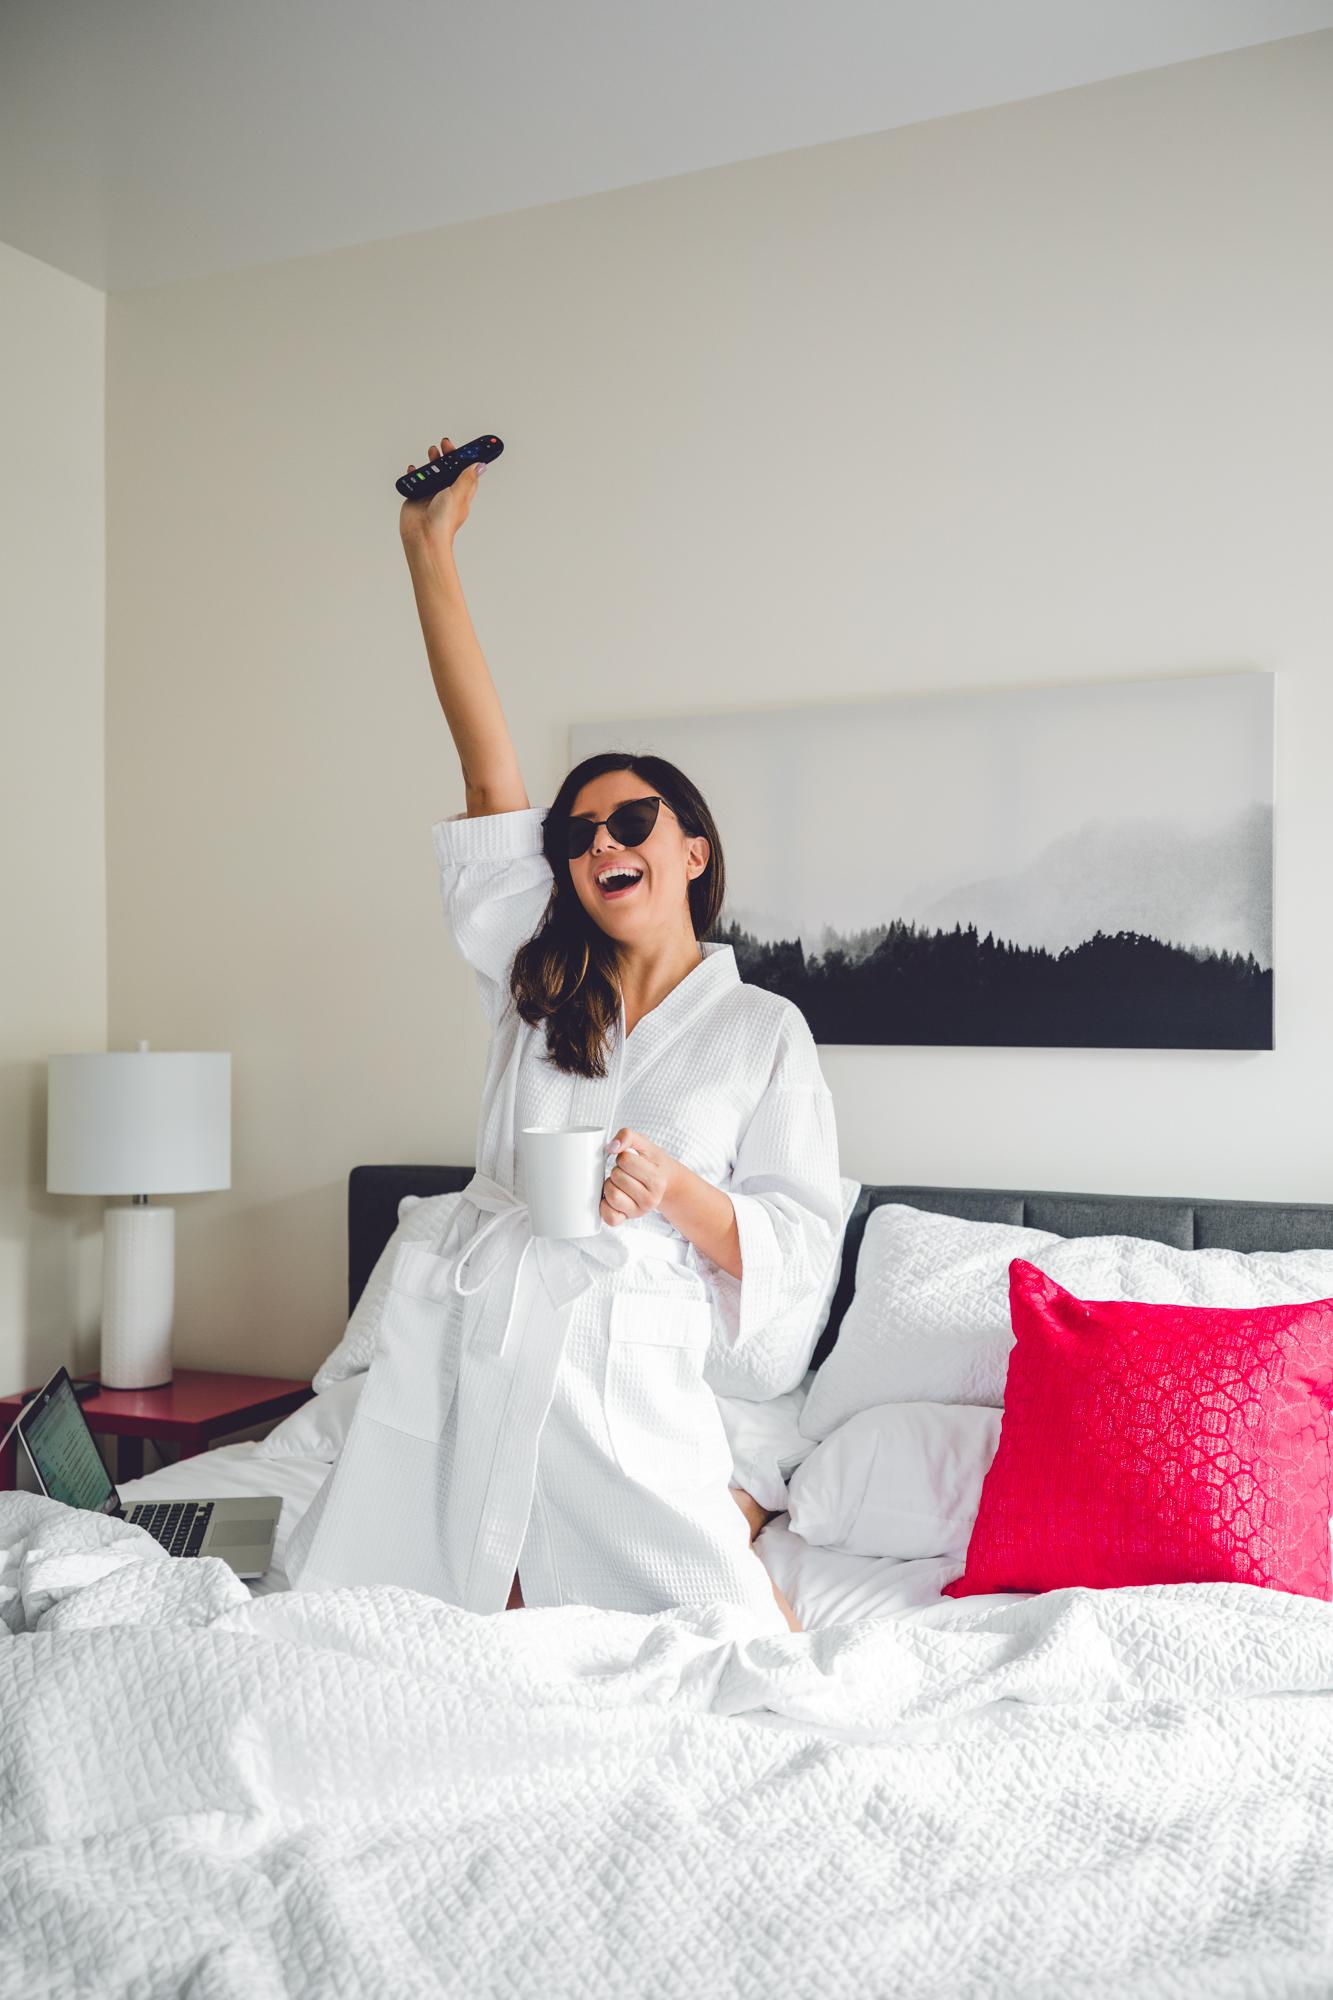 Rachel Off Duty: Long Beach Hotel Review - Hotel Royal